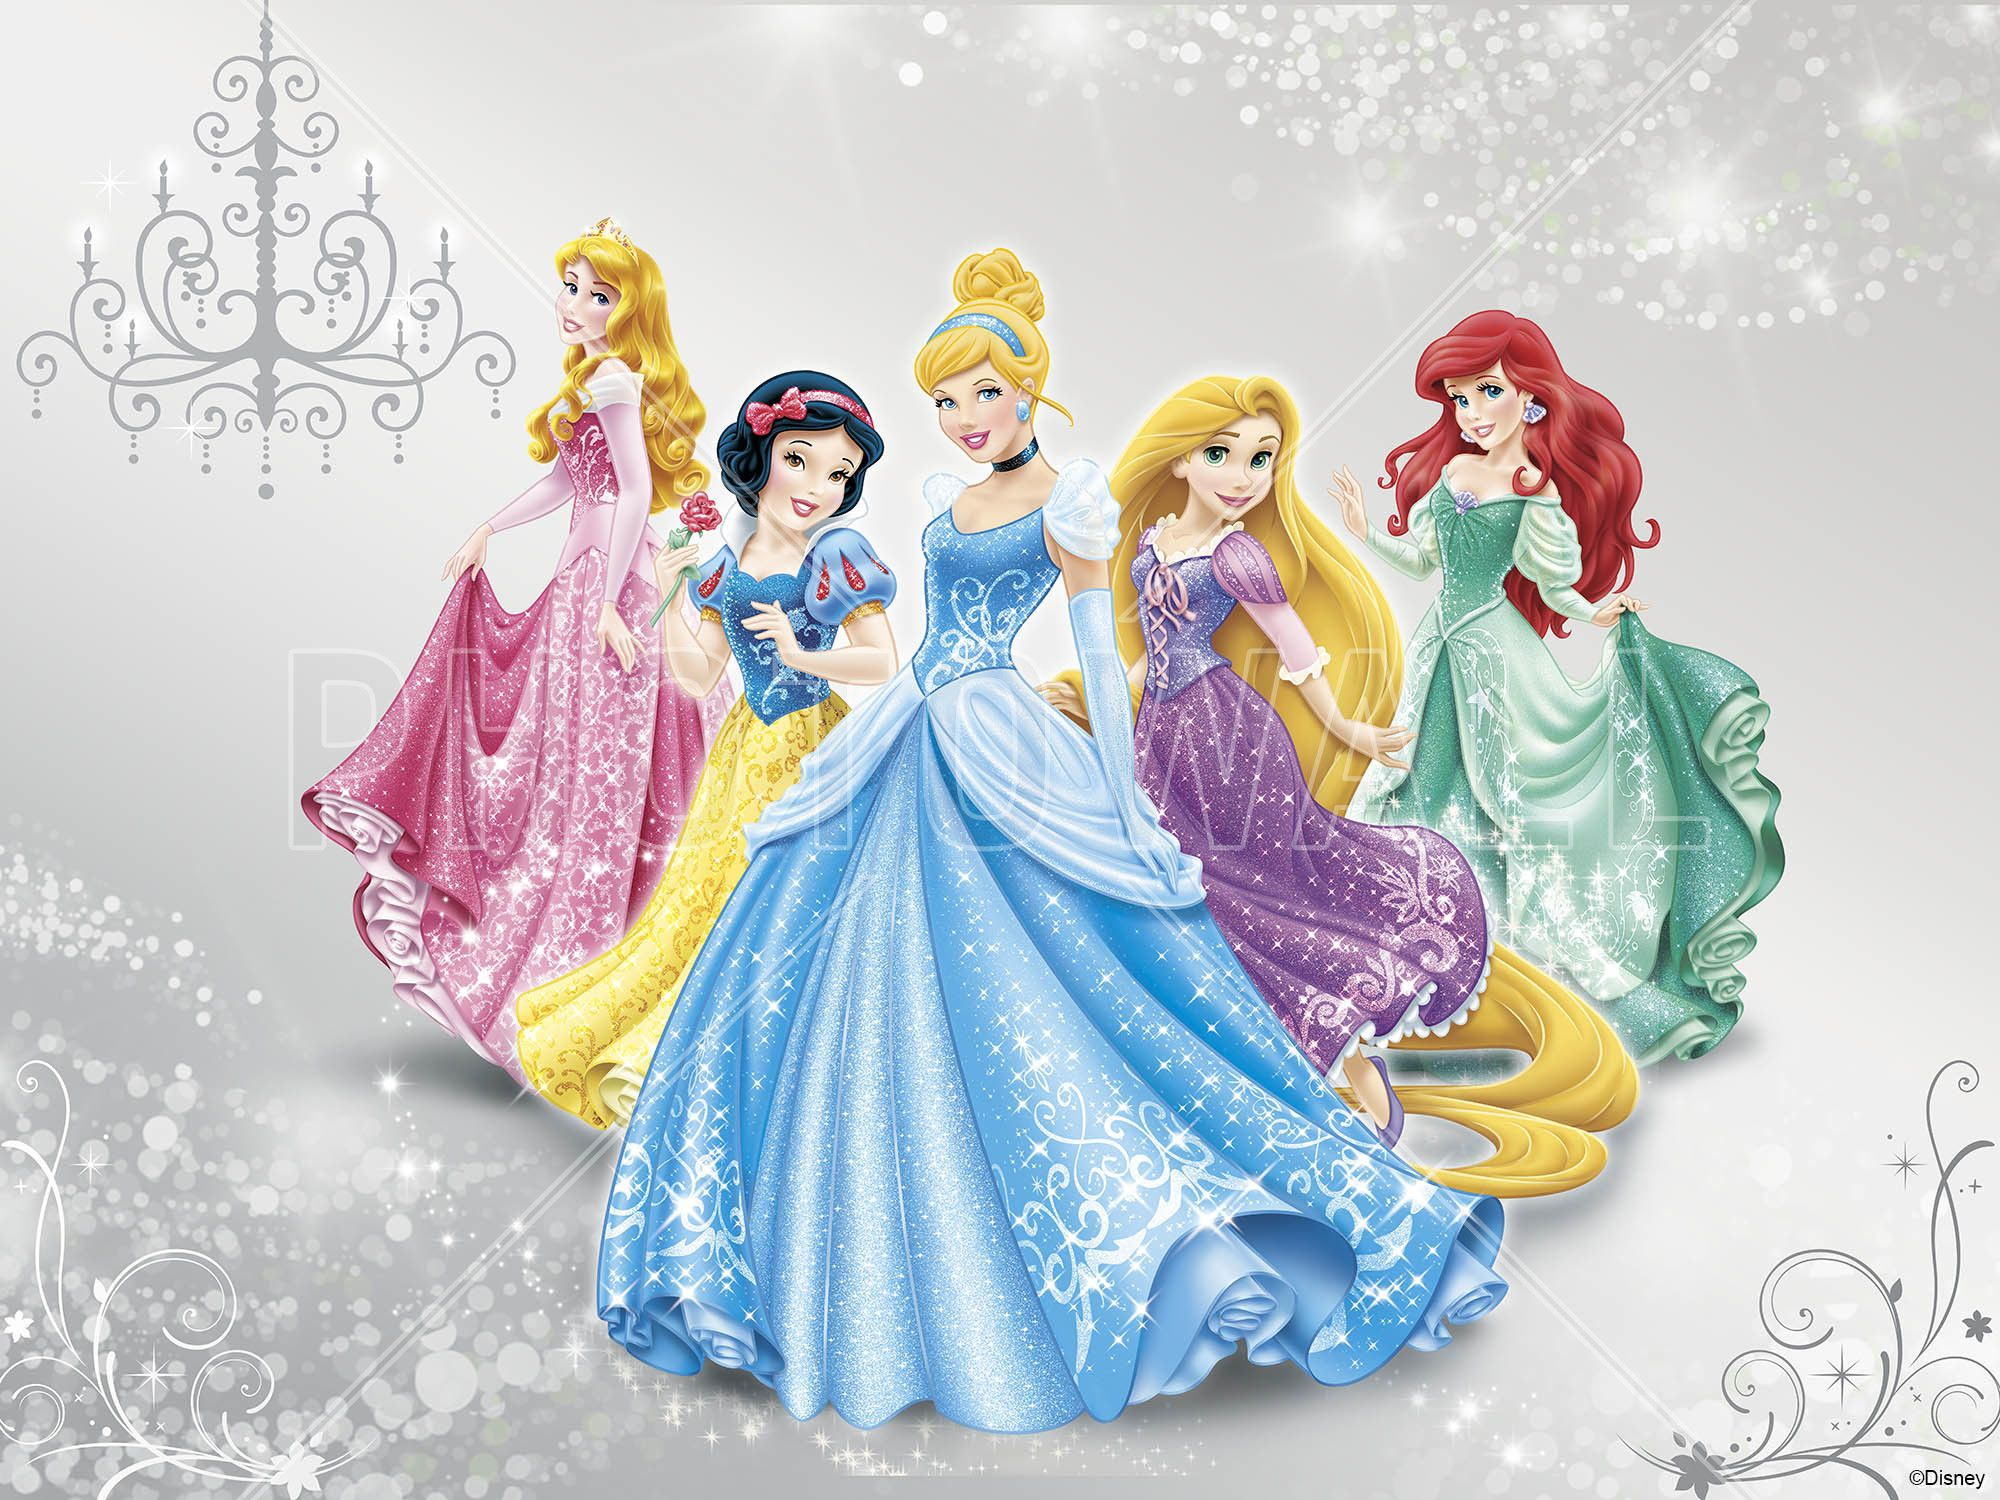 Cinderella Disney Princess Wallpapers Full Hd